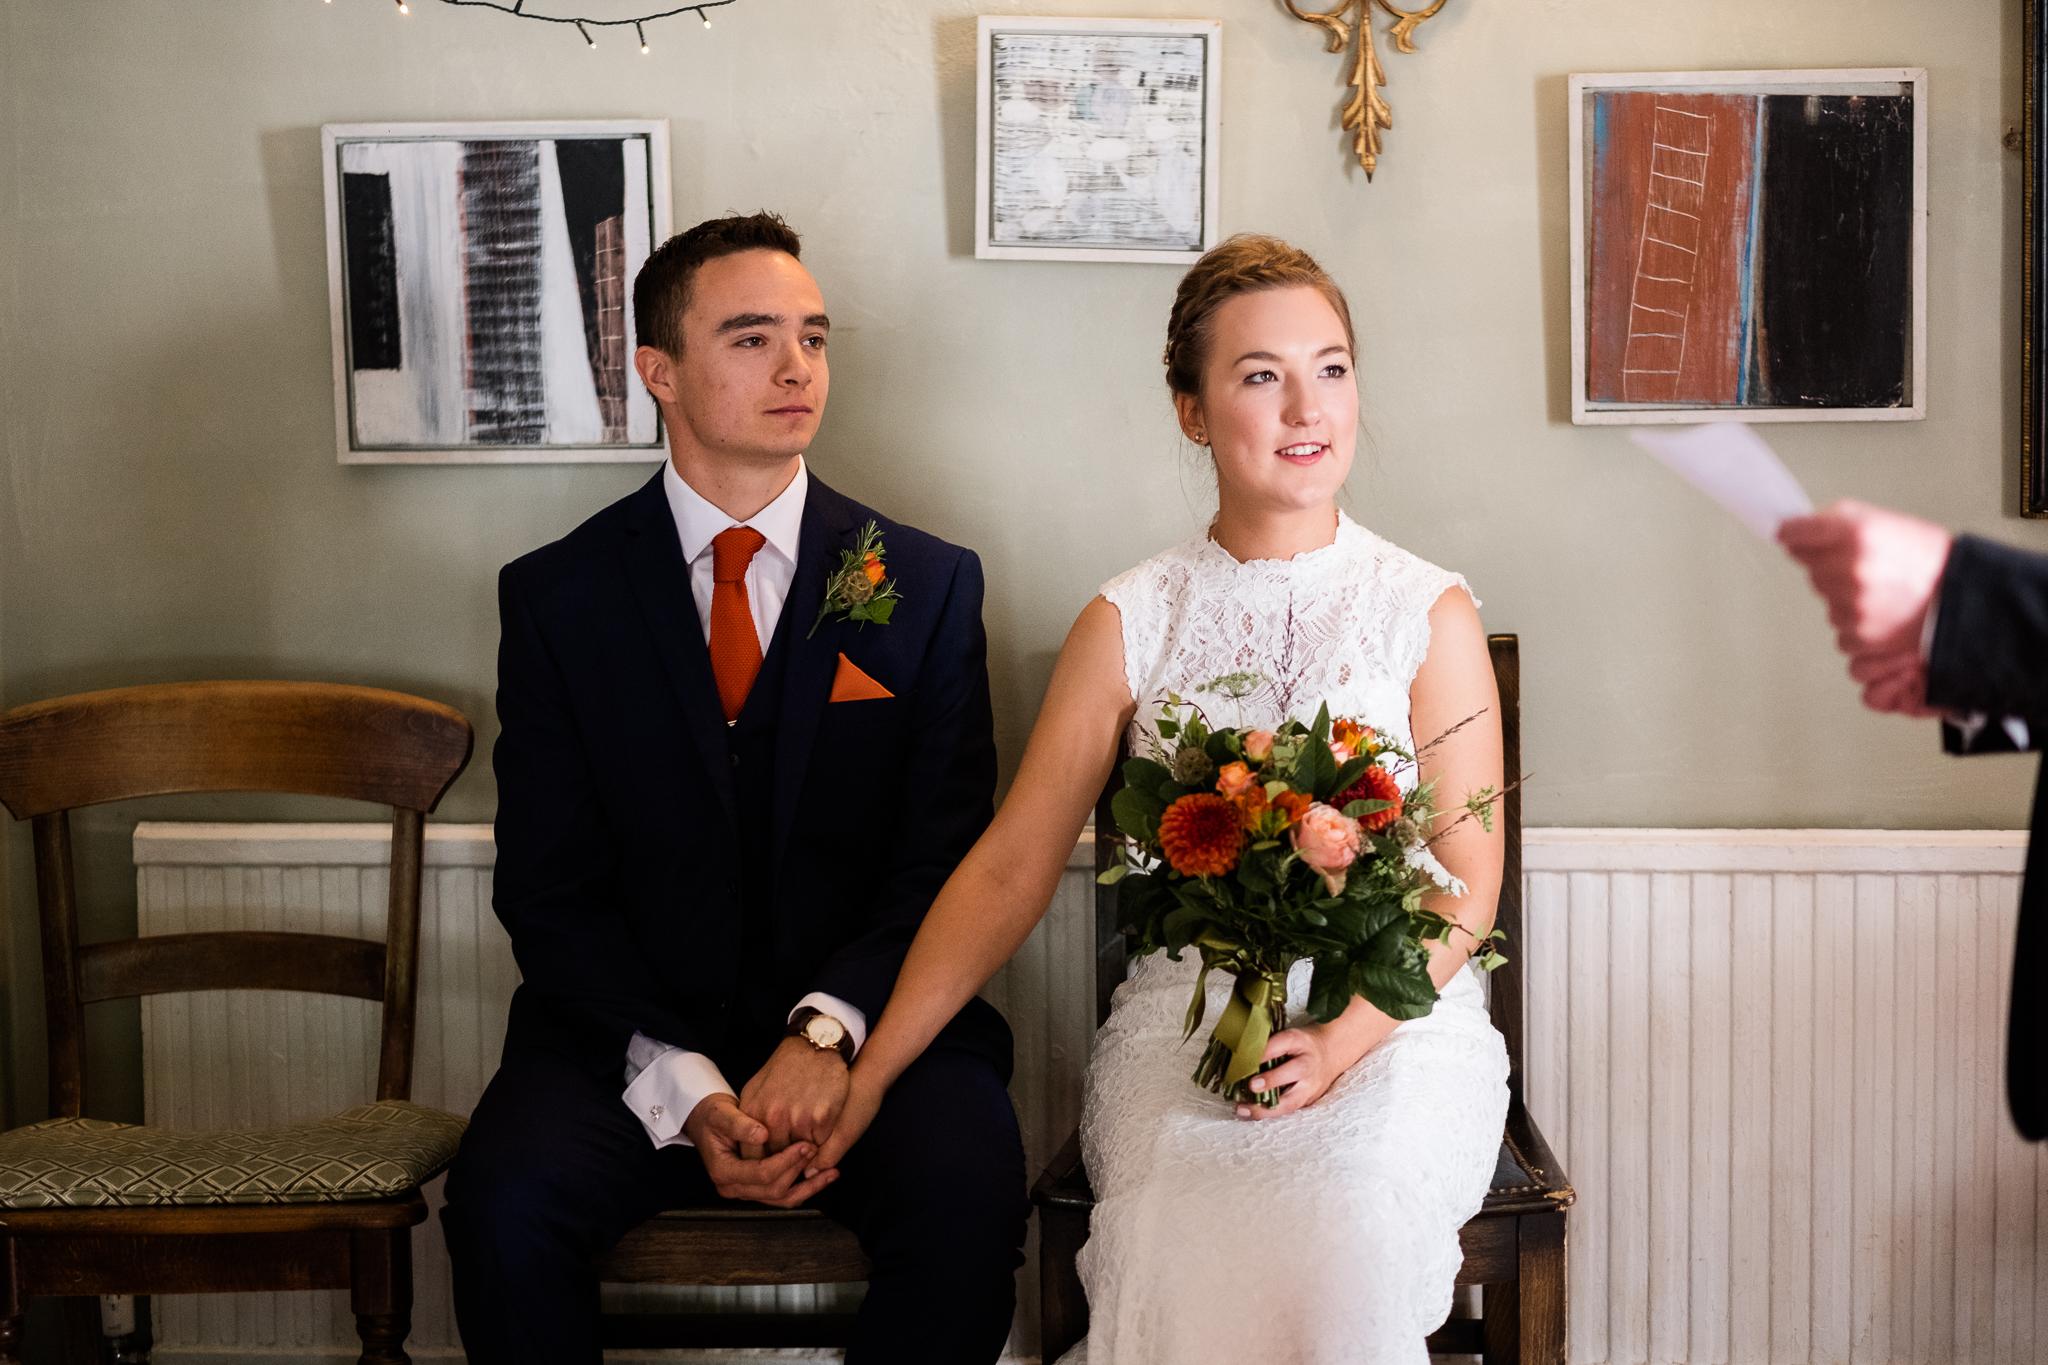 Relaxed Documentary Wedding Photography at The Wizard Inn, Alderley Edge Cheshire - Jenny Harper-26.jpg